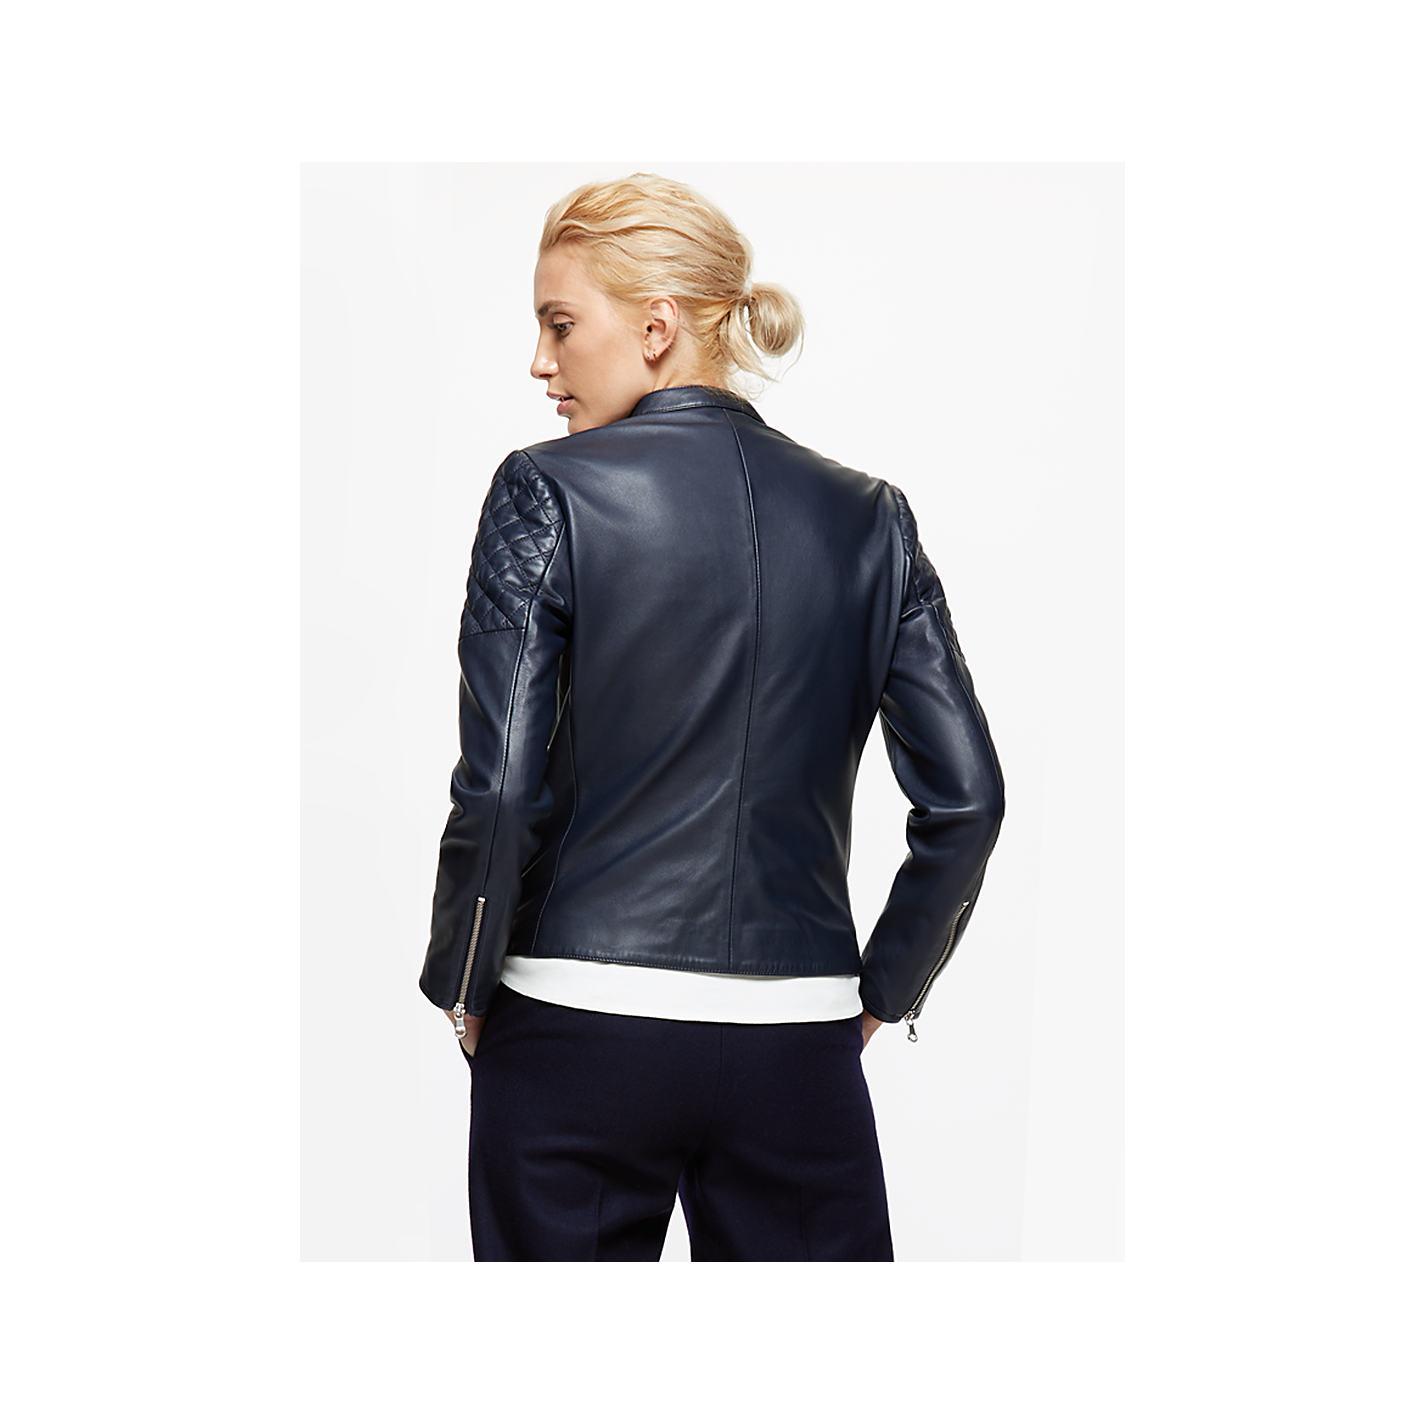 Leather jacket jigsaw - Navy Leather Jacket Jigsaw